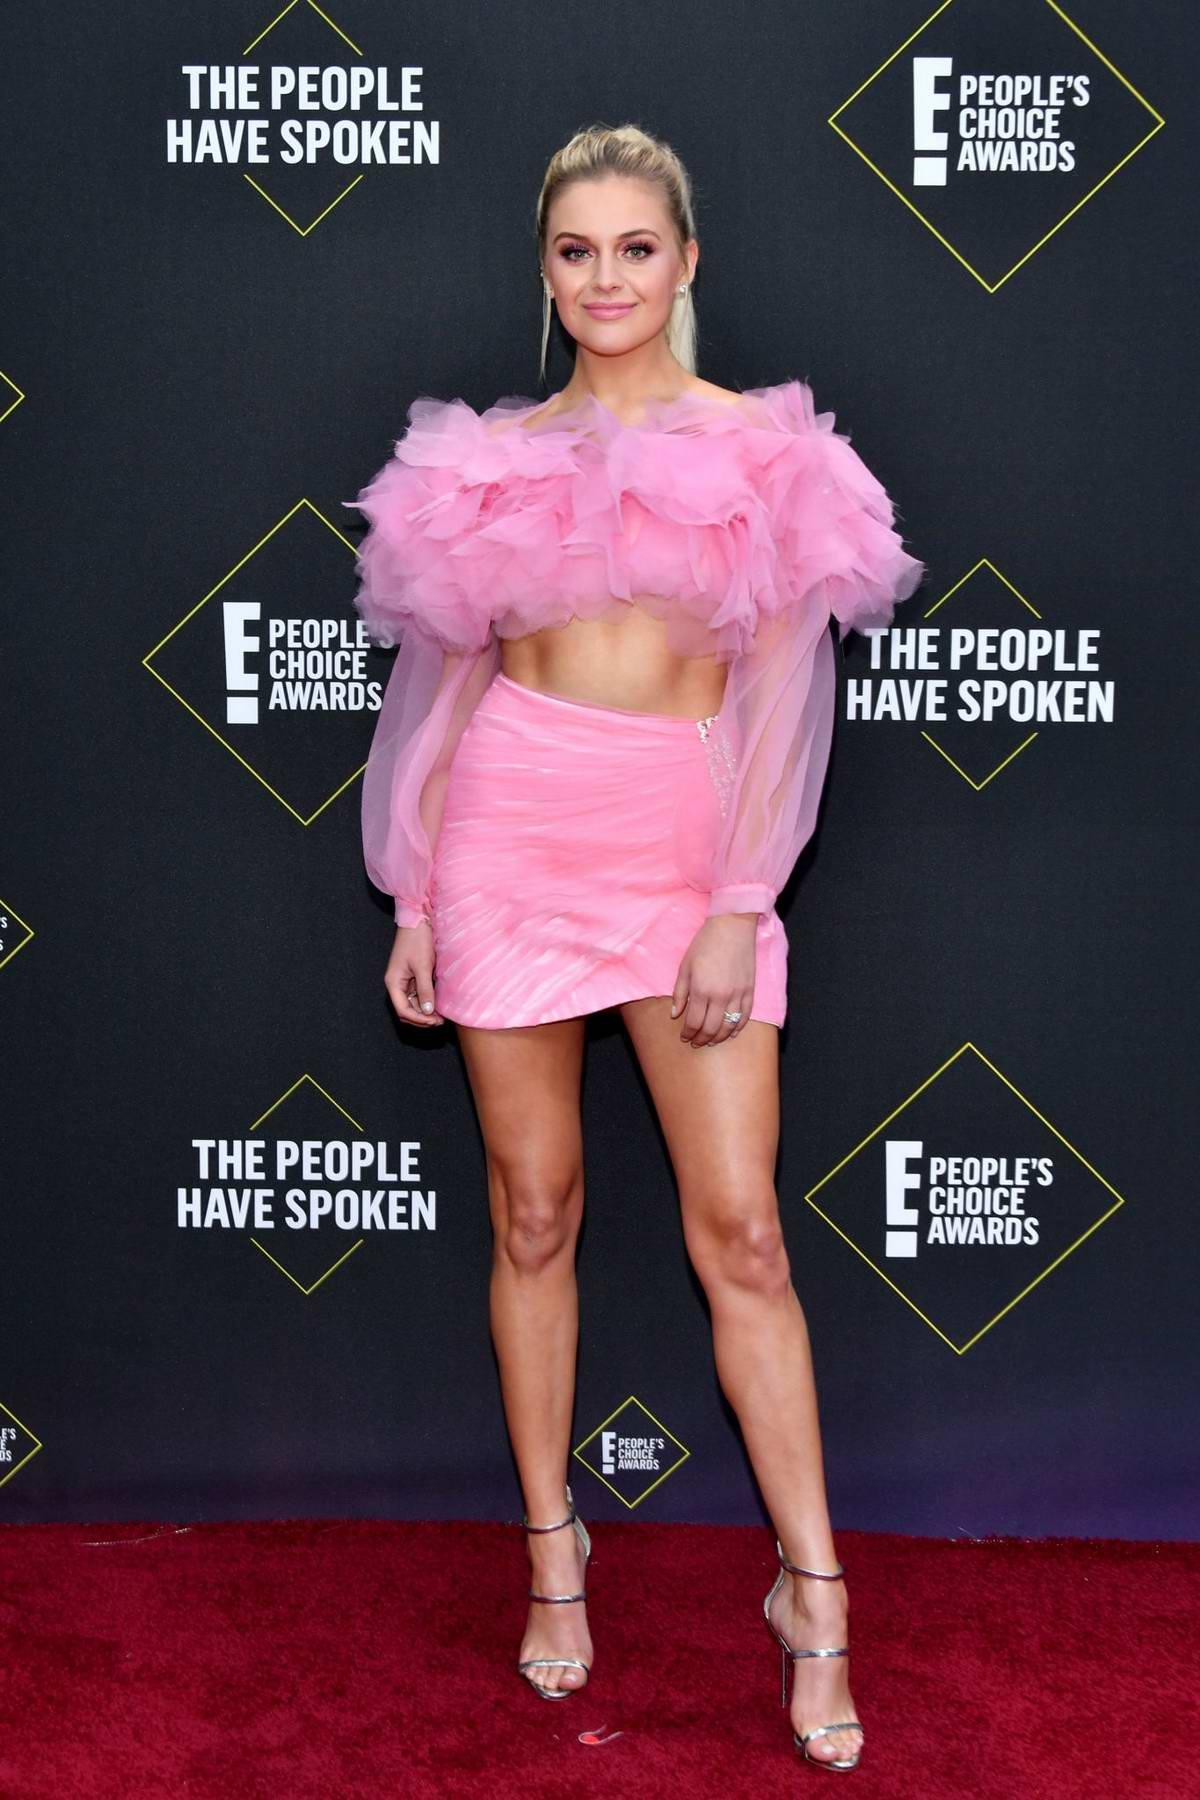 Kelsea Ballerini attends the 2019 E! People's Choice Awards held at the Barker Hangar in Santa Monica, California